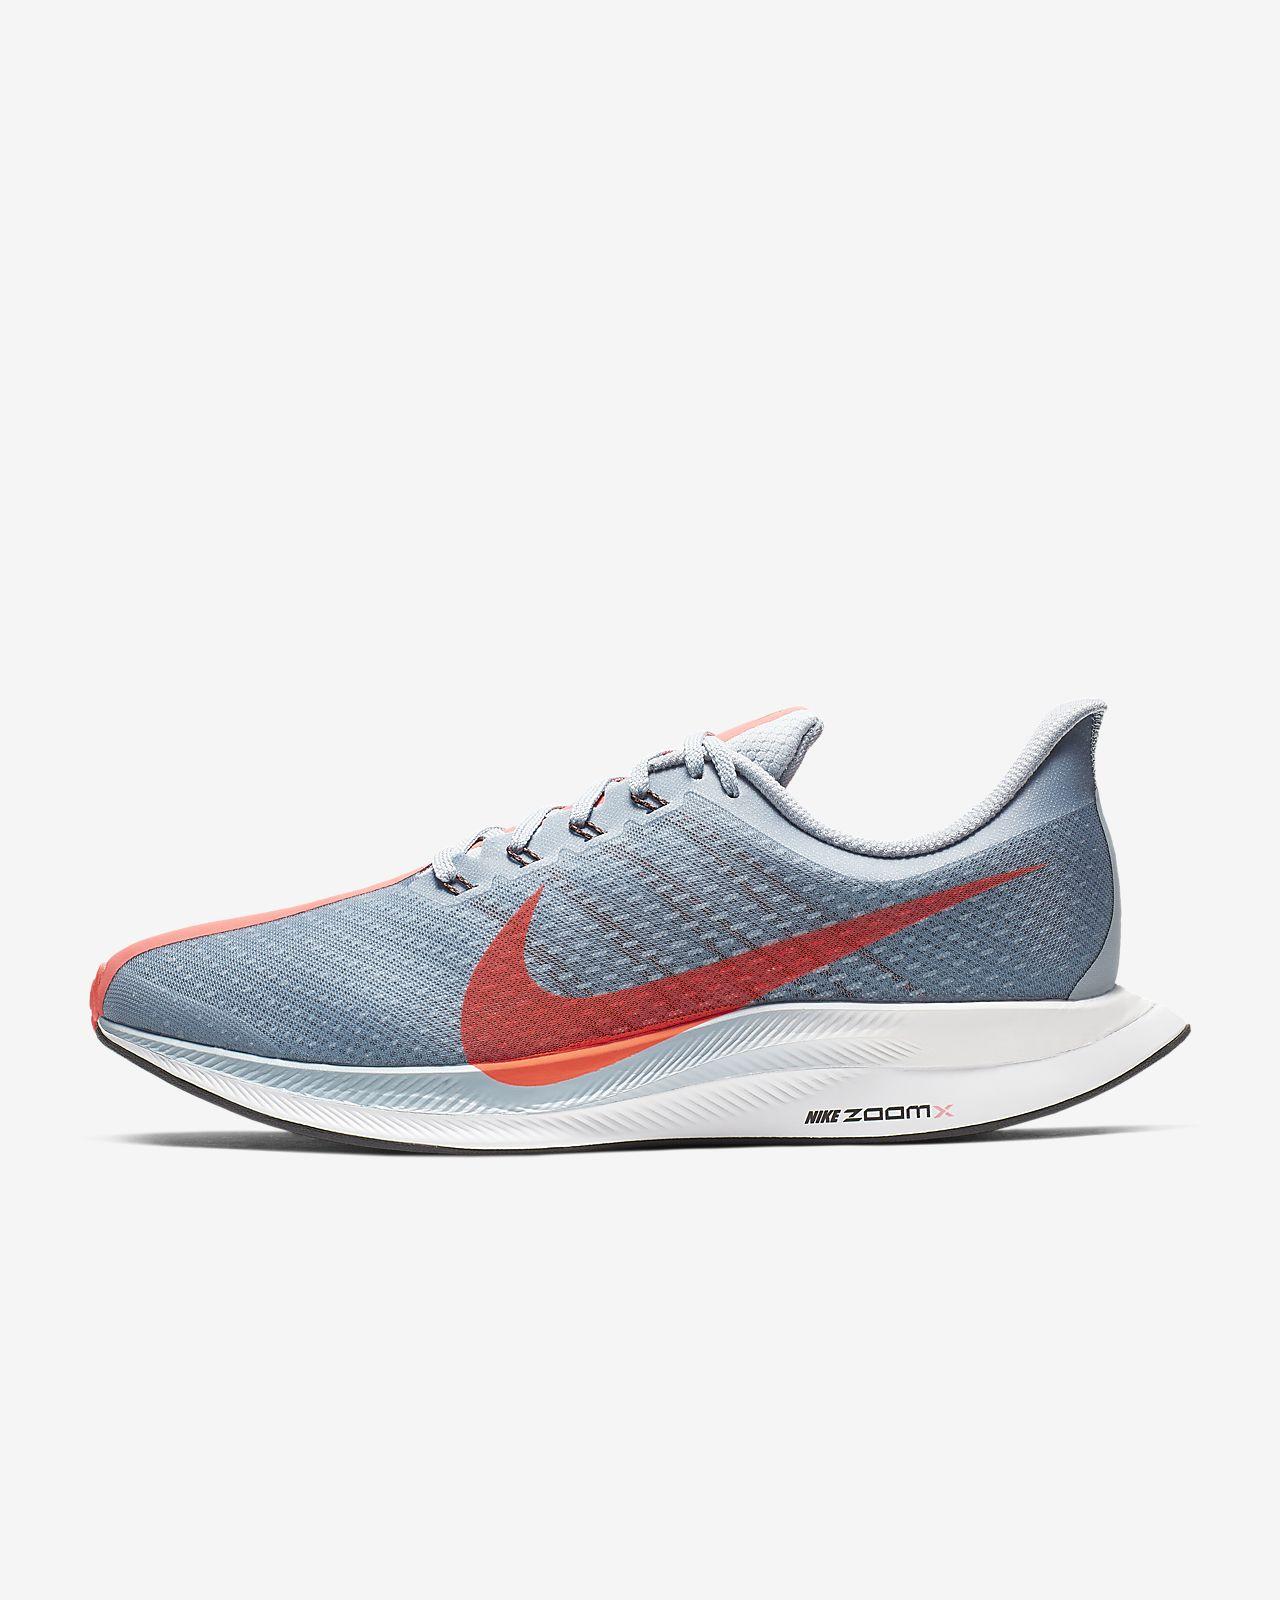 a5bdb007 Мужские беговые кроссовки Nike Zoom Pegasus Turbo. Nike.com RU